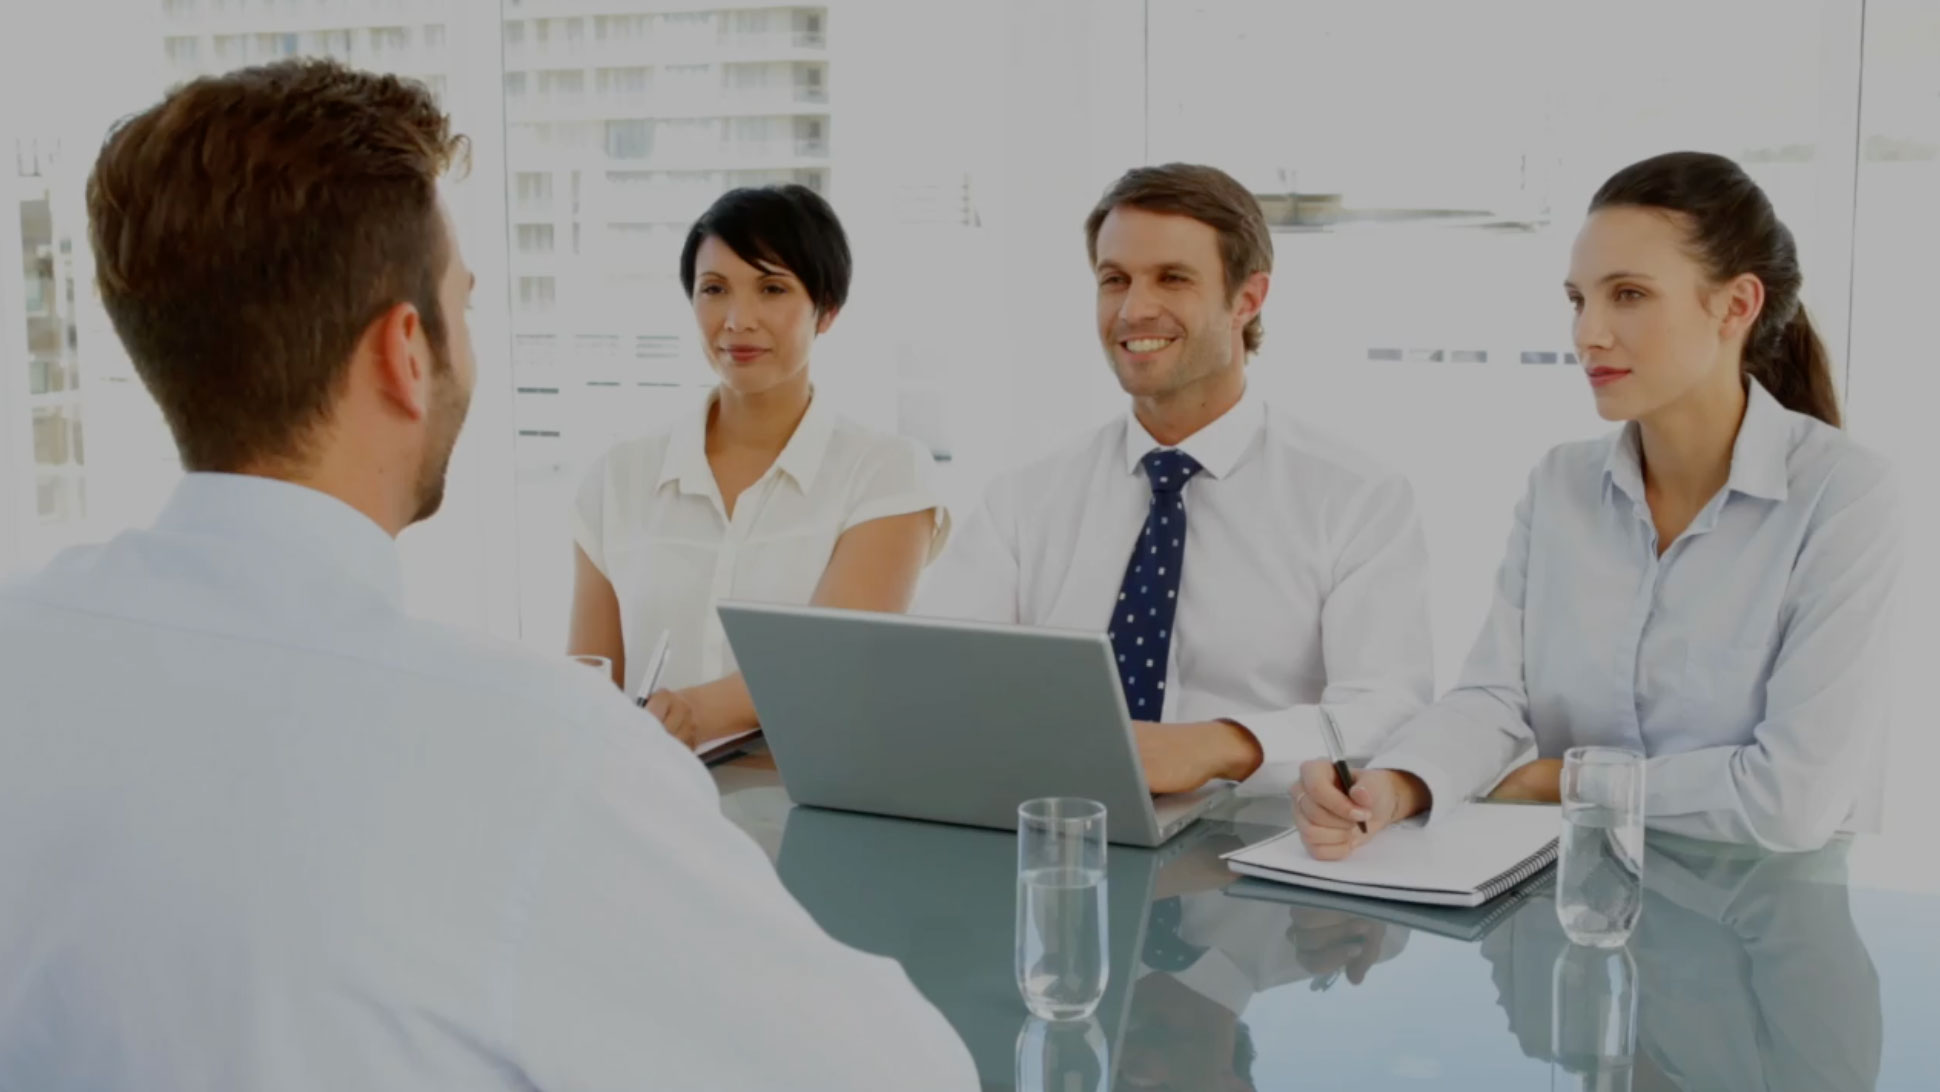 ISC GmbH, Personalberatung, Arbeitsschutz, Datenschutzbeauftragter, Personalagentur